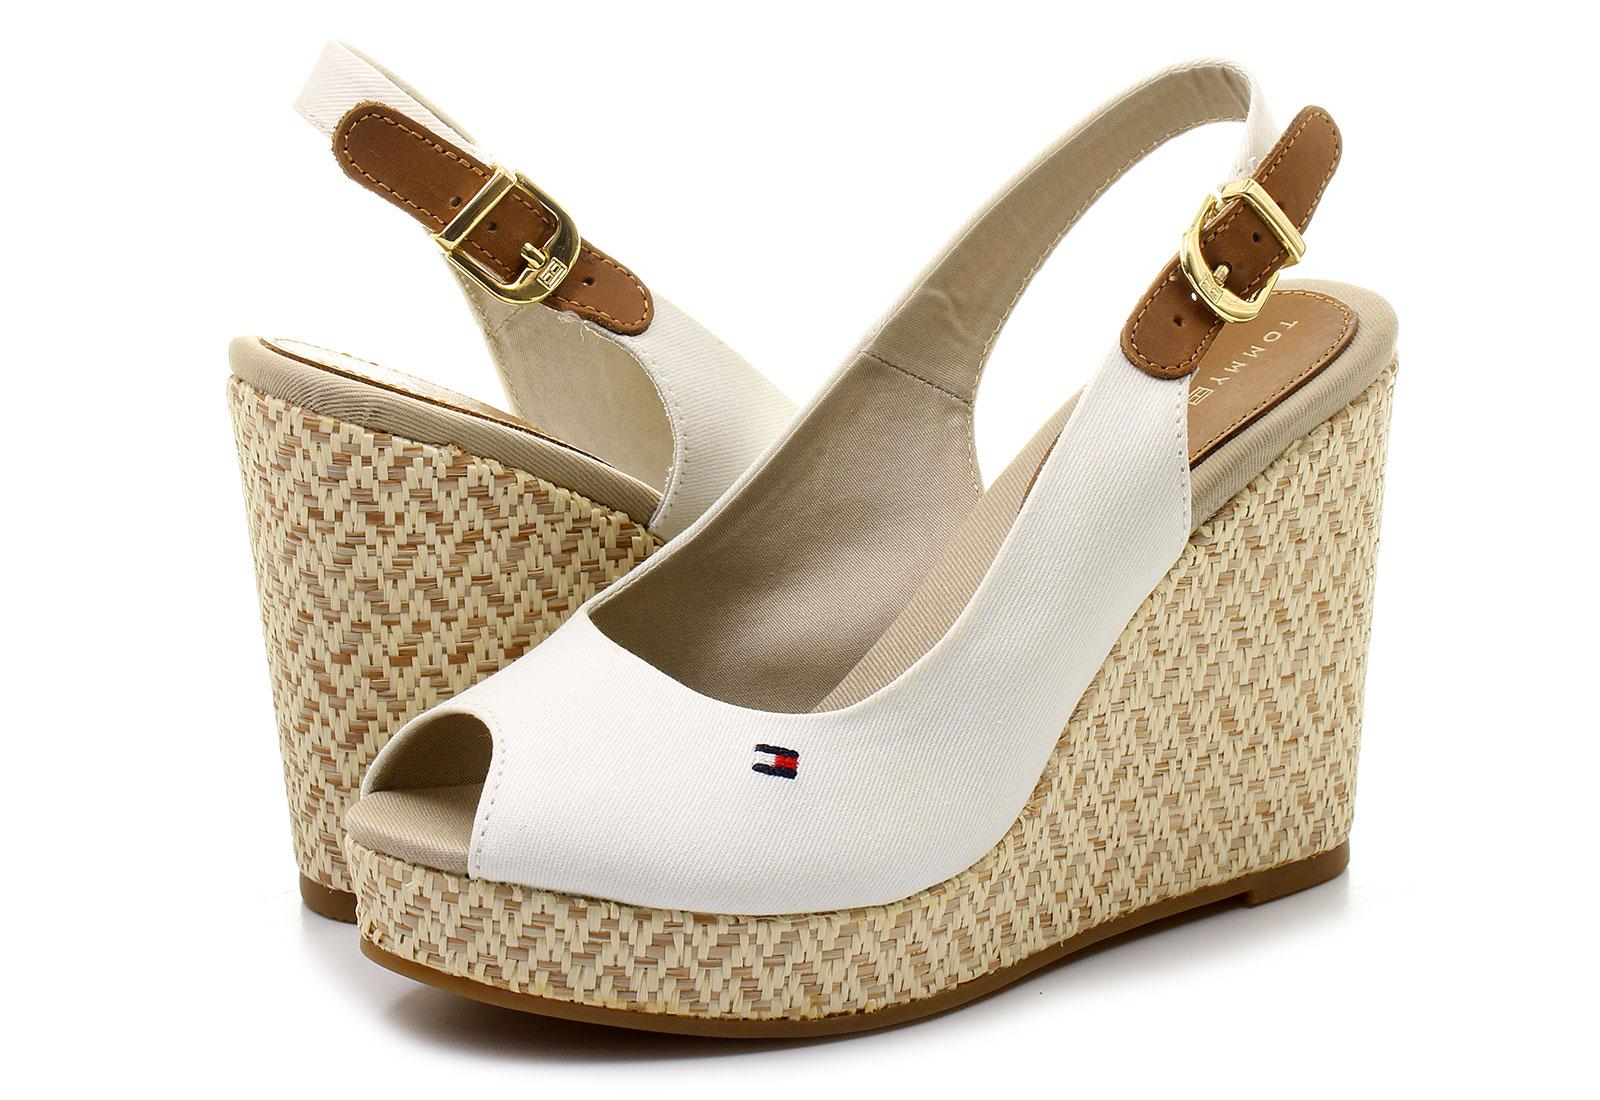 ee6a6d8649 Tommy Hilfiger Szandál - Elena 7d - 16S-0653-118 - Office Shoes ...